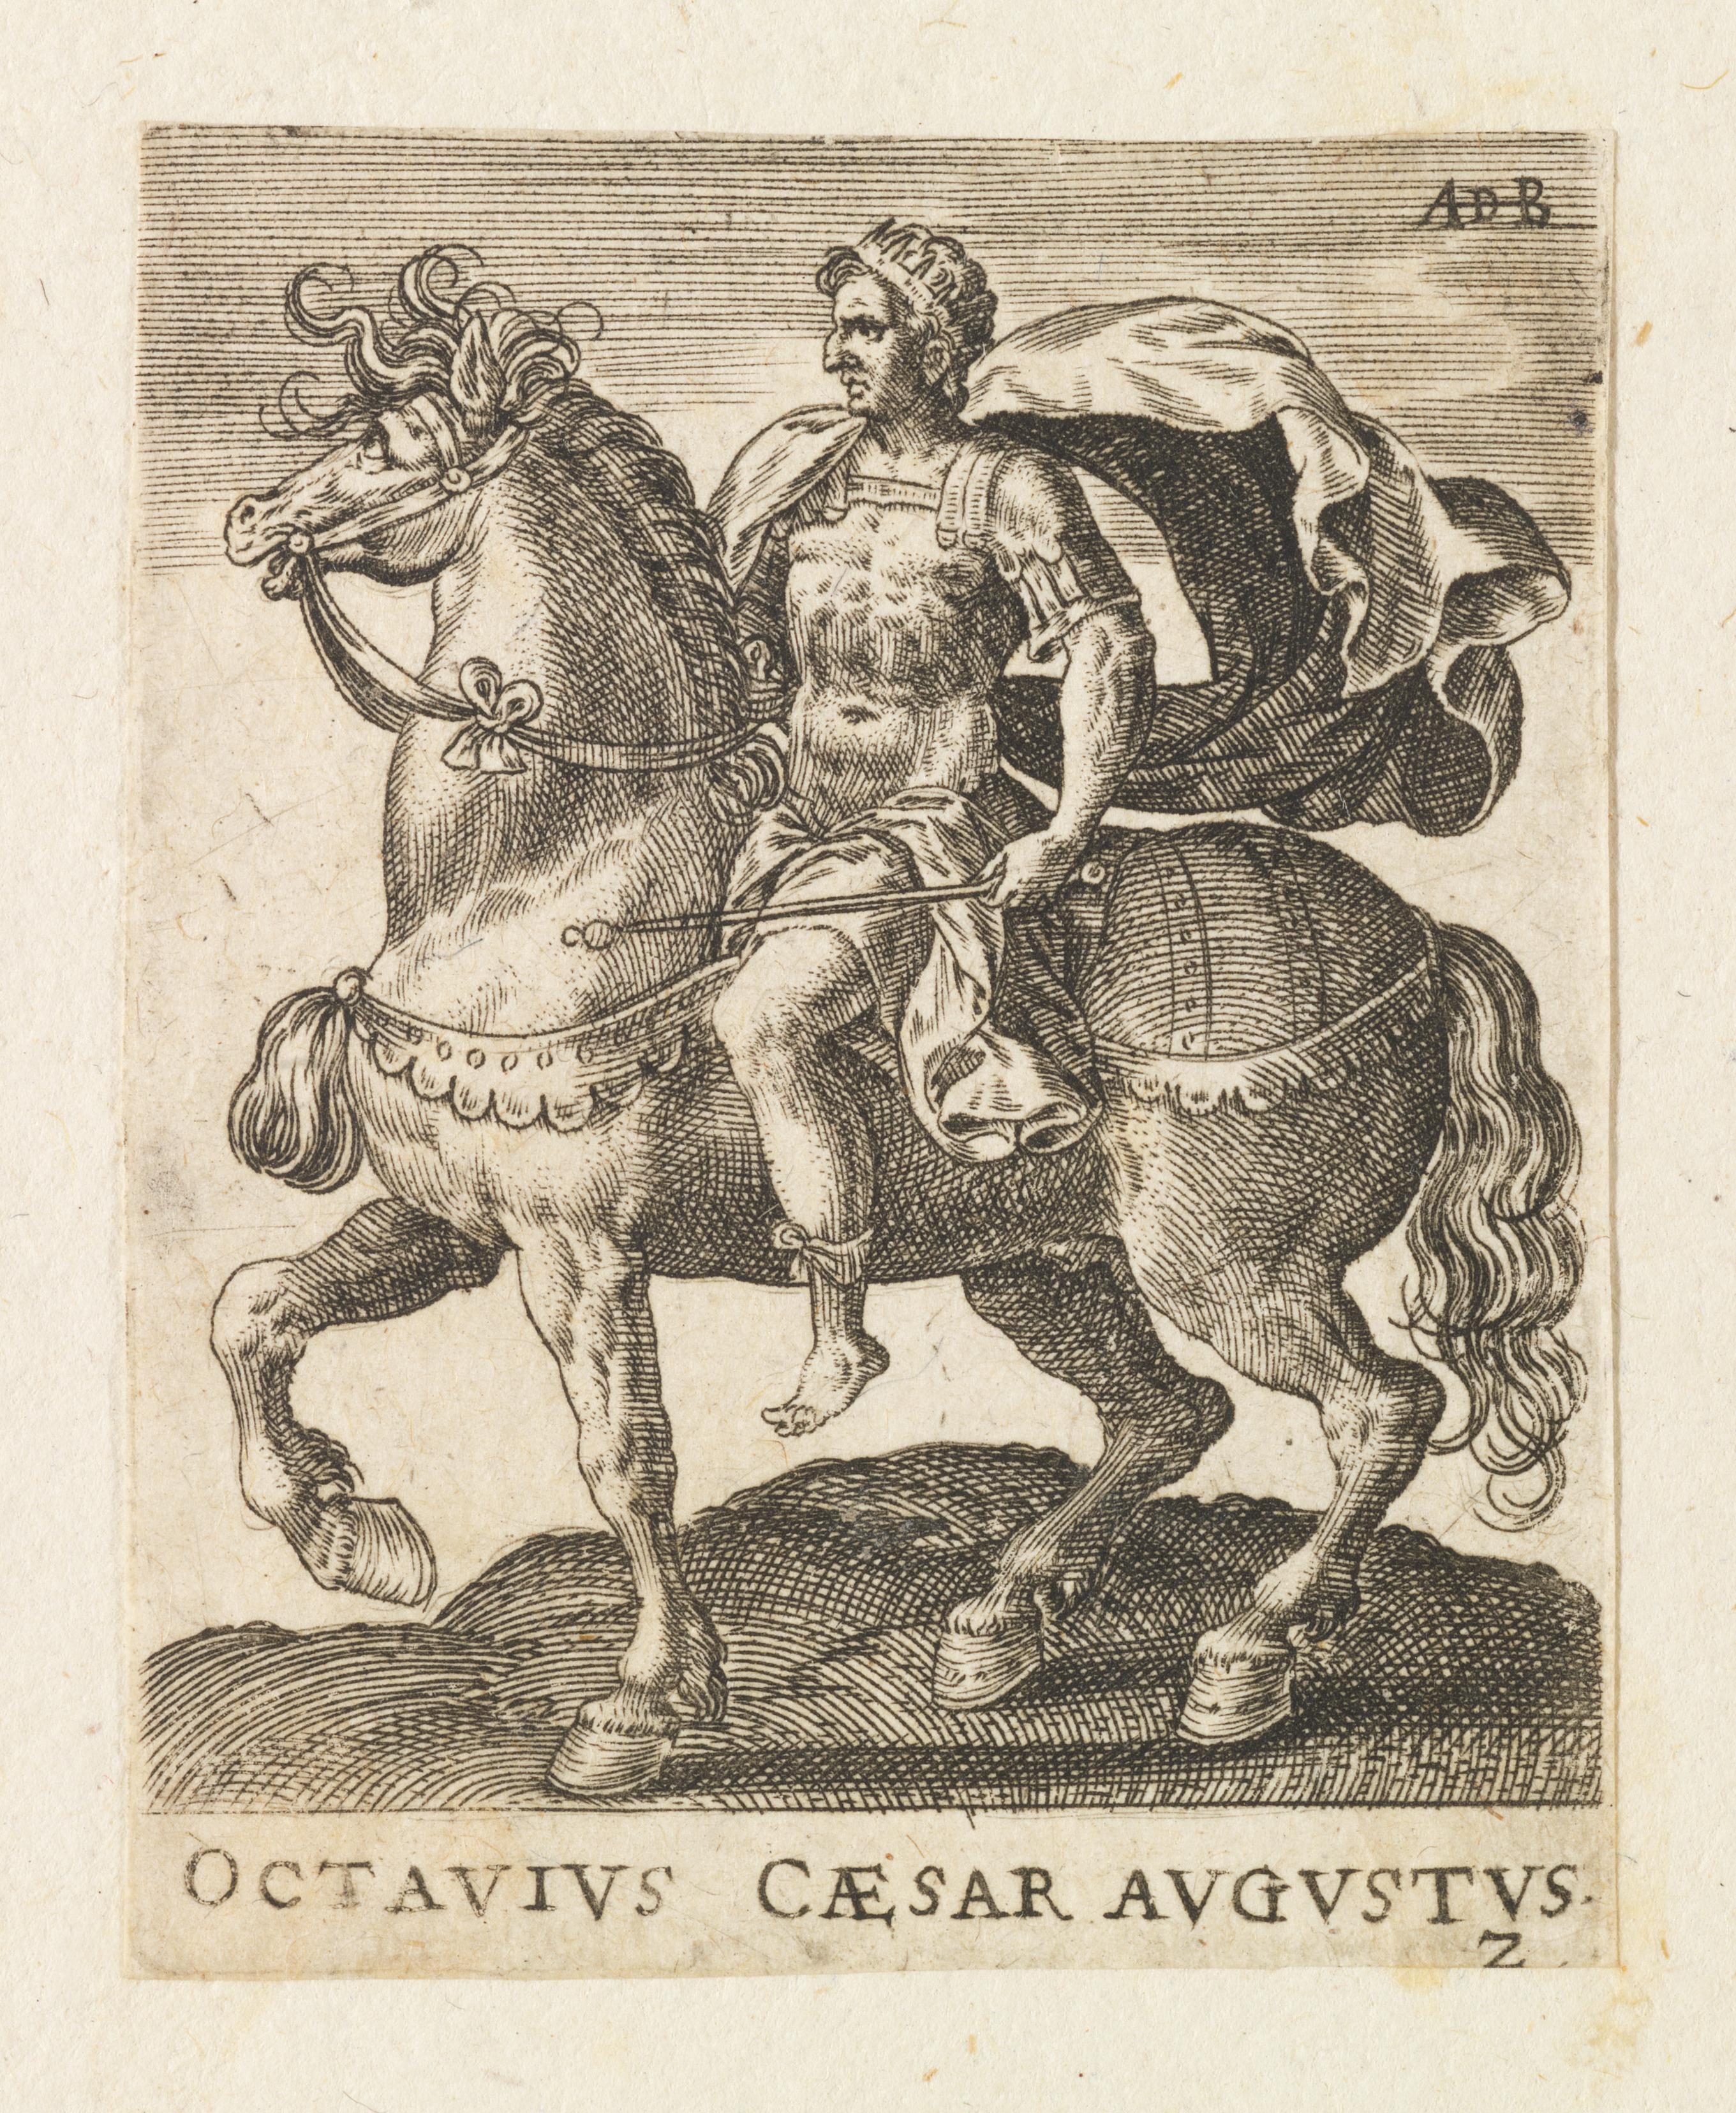 File:Octavius Caesar Augustus from Twelve Caesars on Horseback MET DP-1341 -001